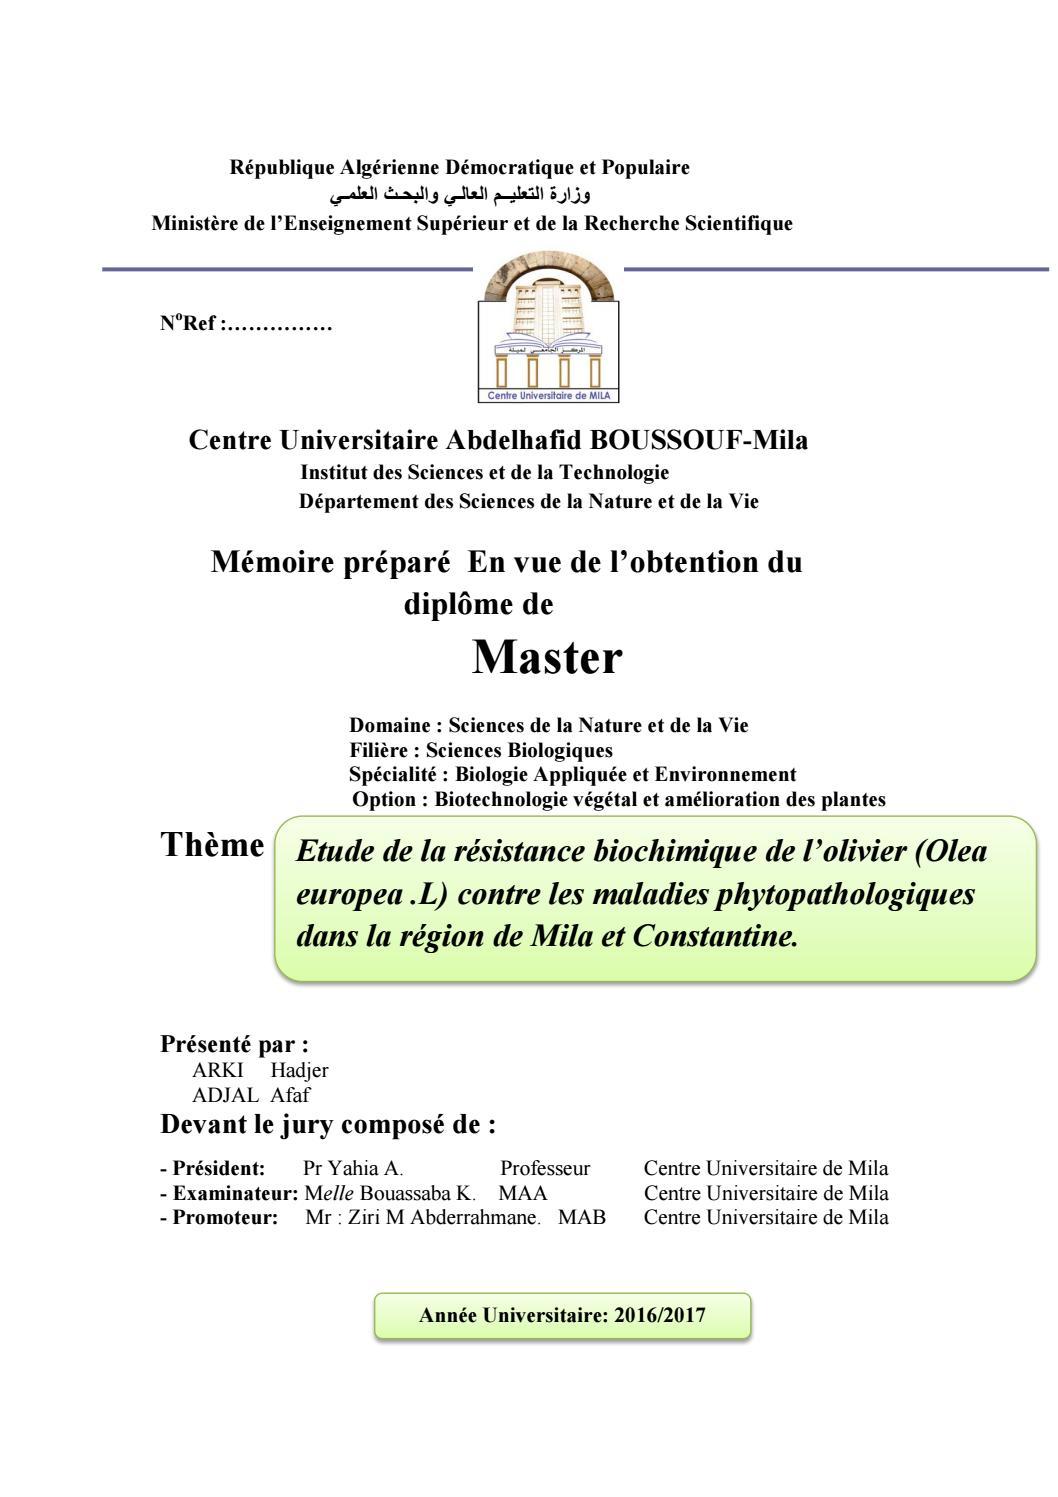 Il Cultive L Olivier mémoire de master milafmohammed abderrahmane ziri - issuu